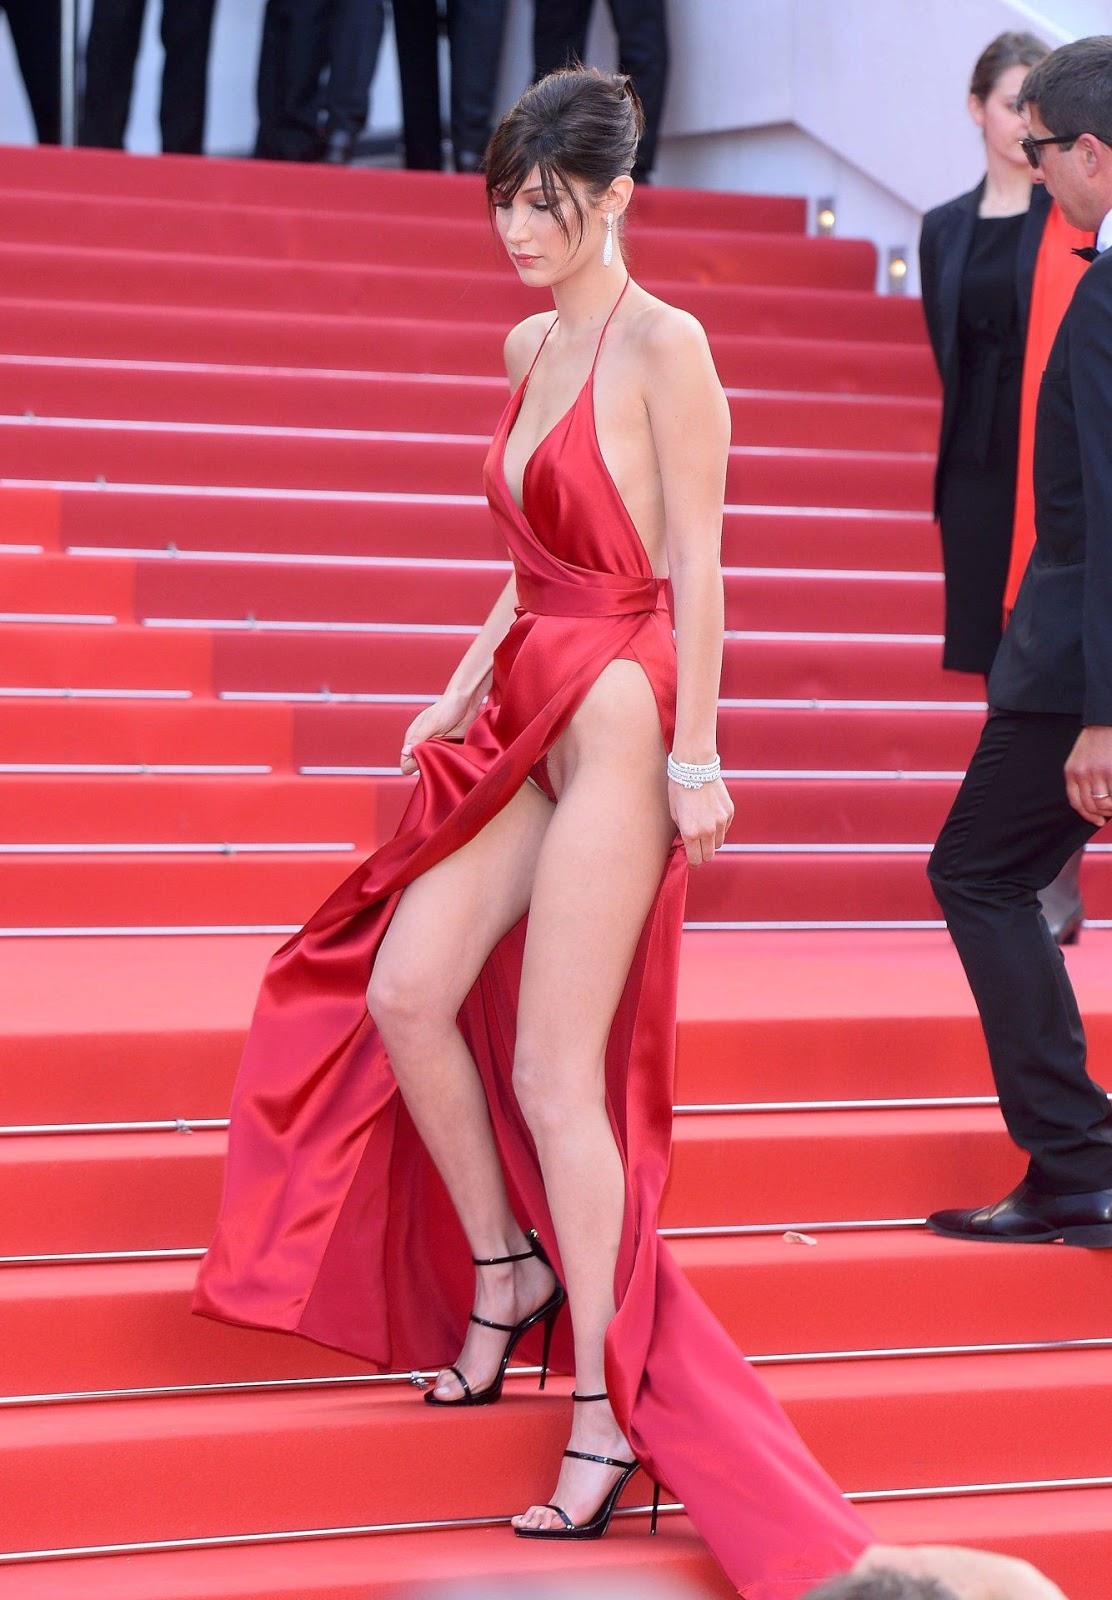 Priyanka chopra's red hot look wins her a best dressed spot